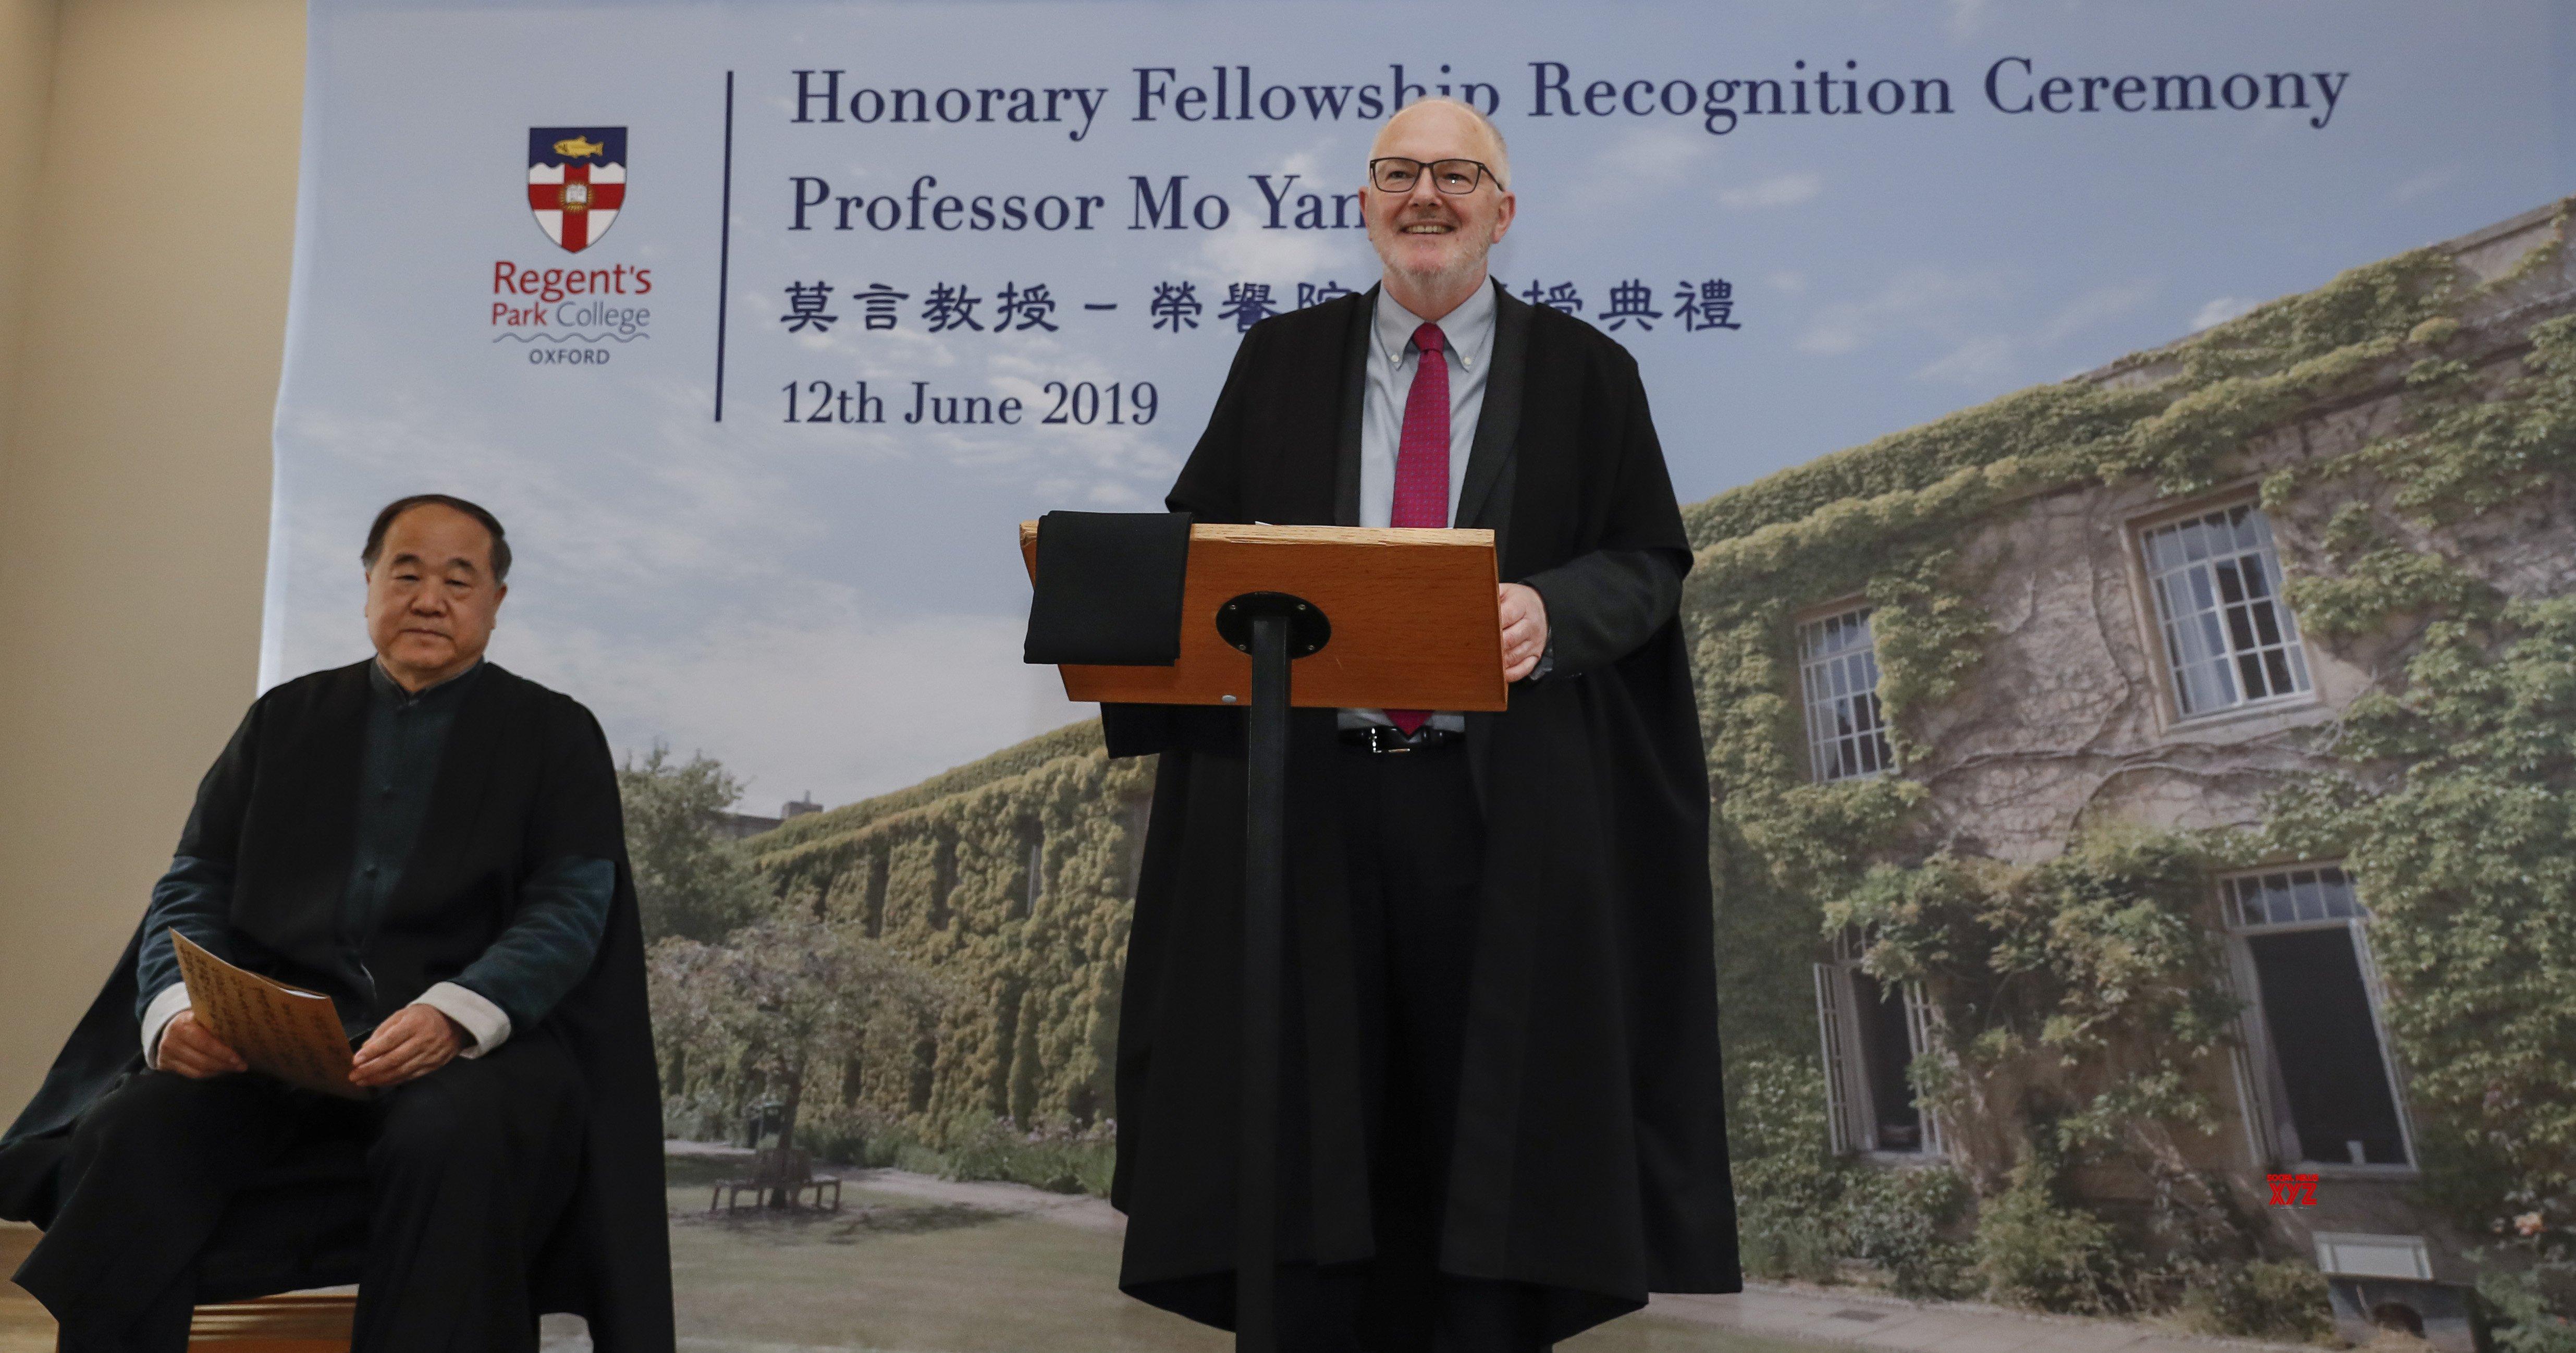 BRITAIN - OXFORD - CHINESE NOBEL LAUREATE - MO YAN - HONORARY FELLOWSHIP #Gallery